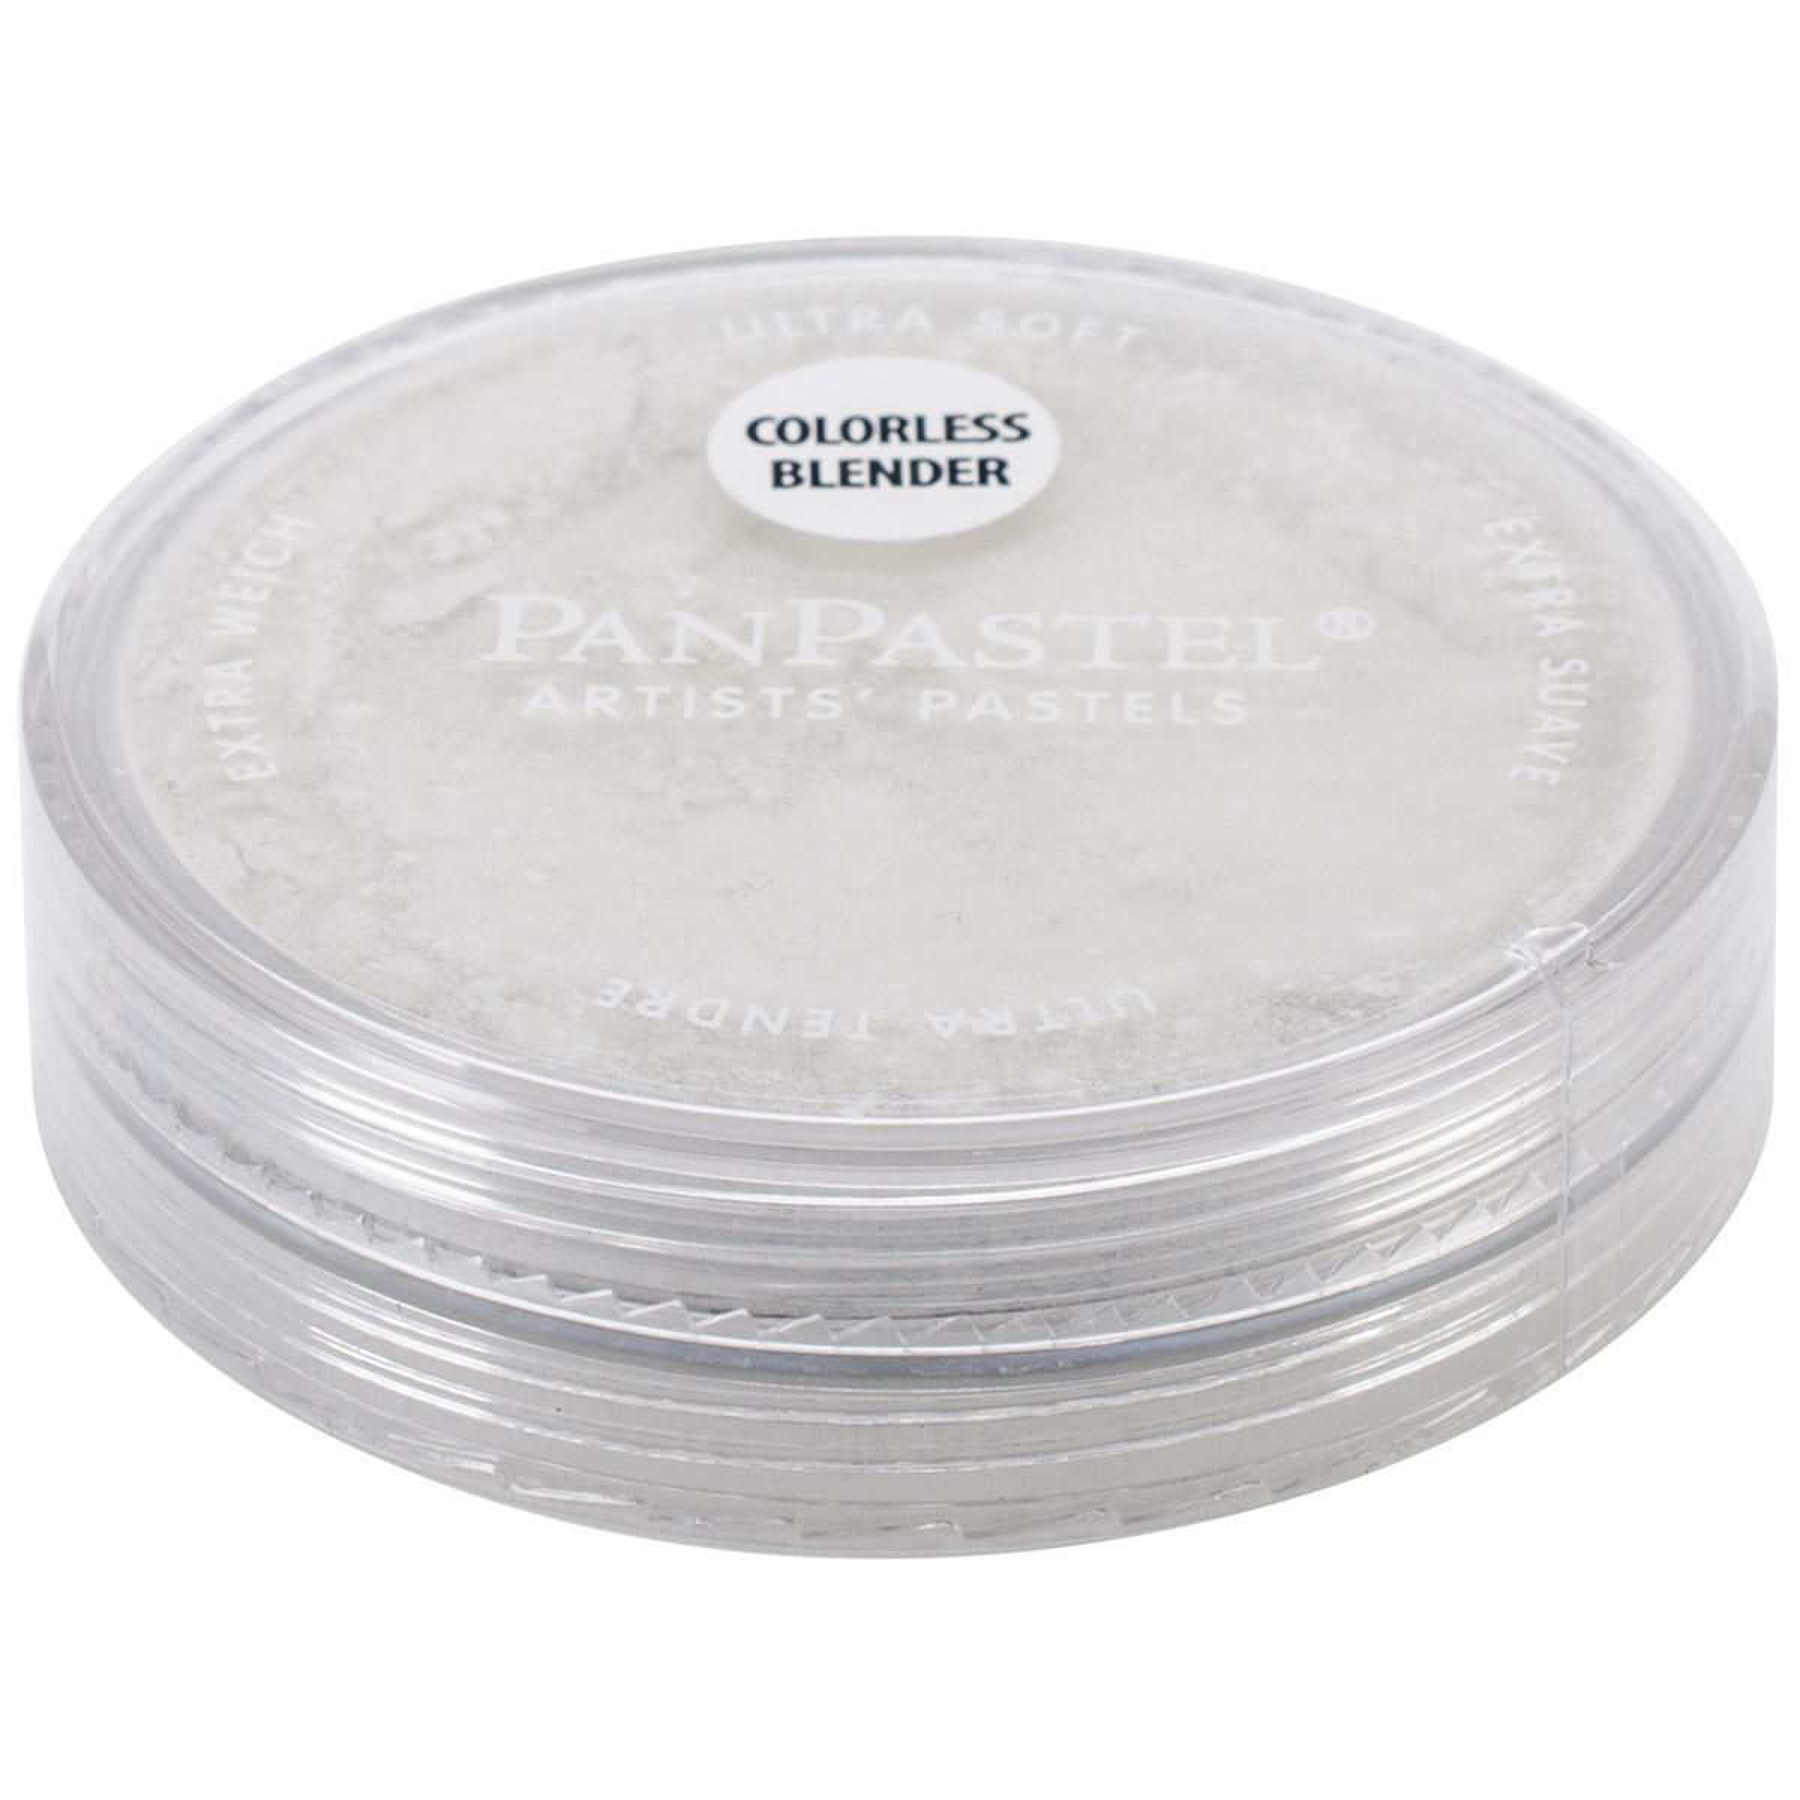 PanPastel Ultra Soft Colorless Blender 9ml-